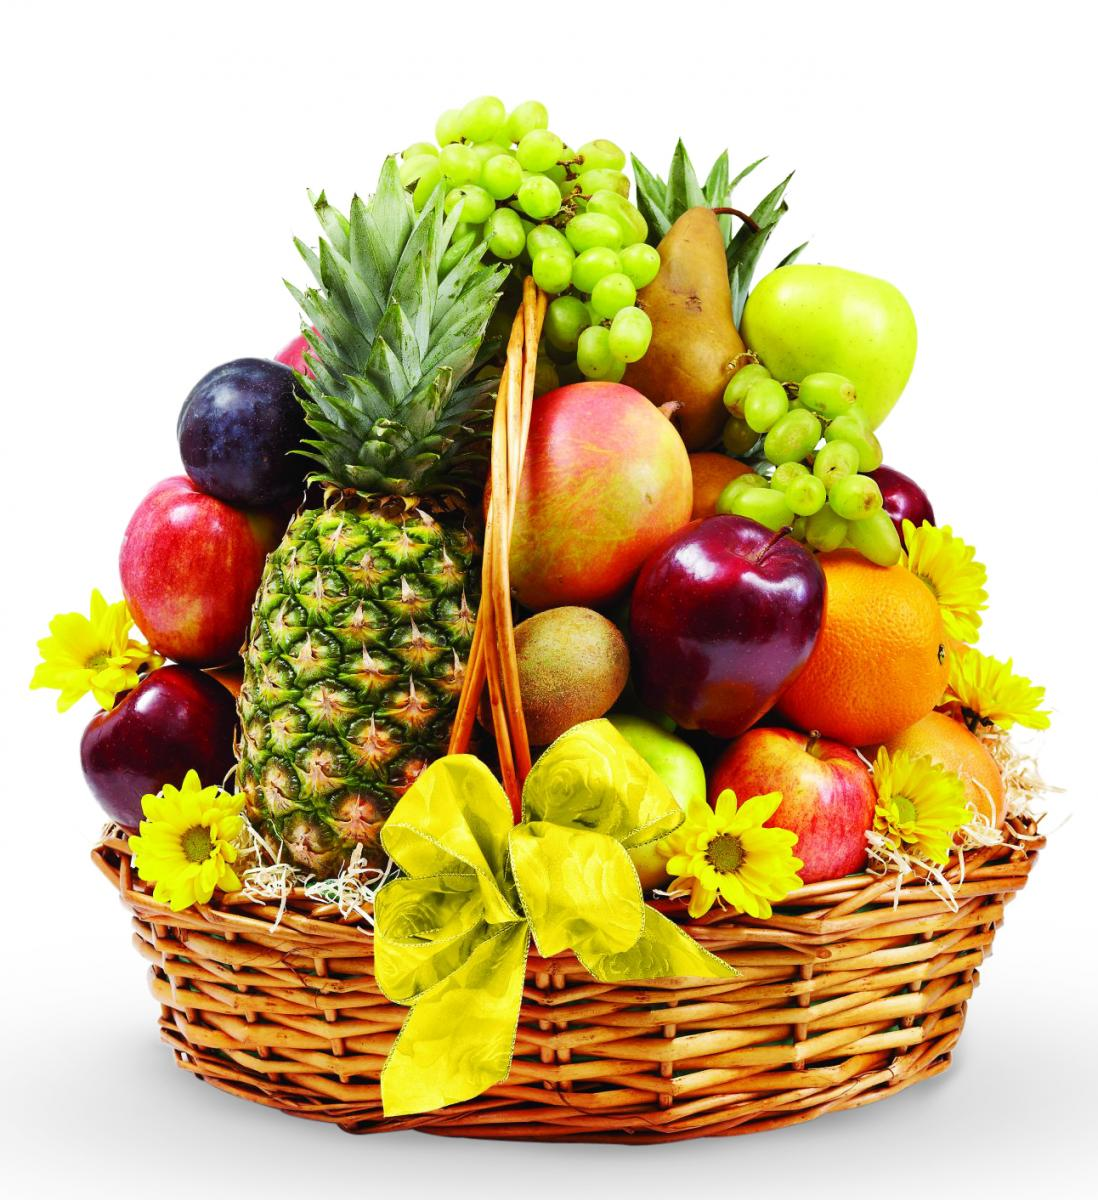 avasflowers-bon-appetit-fruit-basket_max